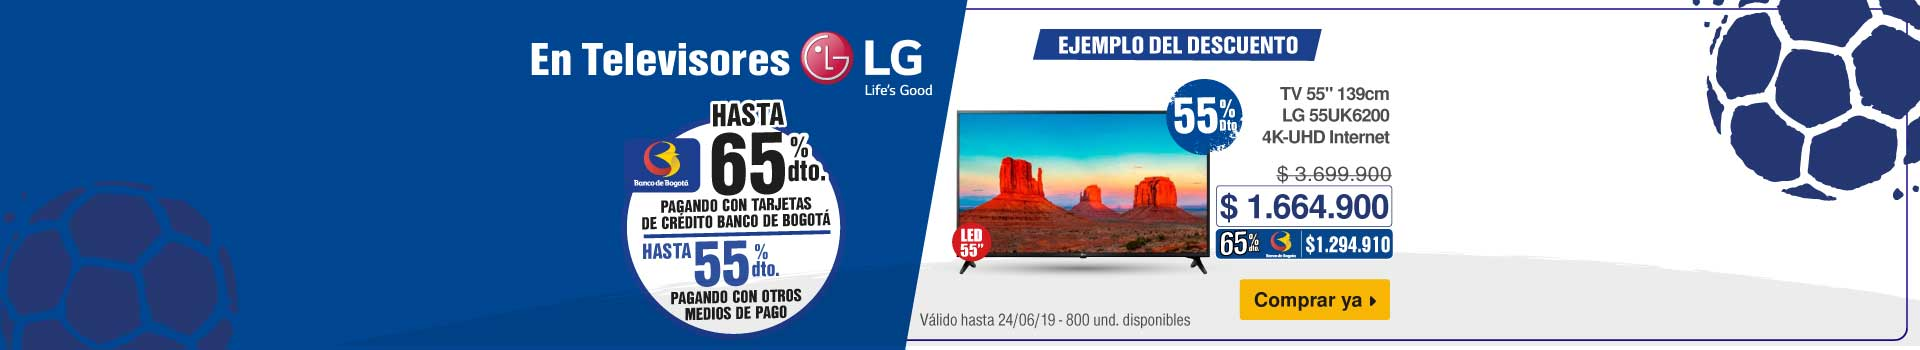 AK-TV-LG-HiperOfertas_TV_Video1-22JUN